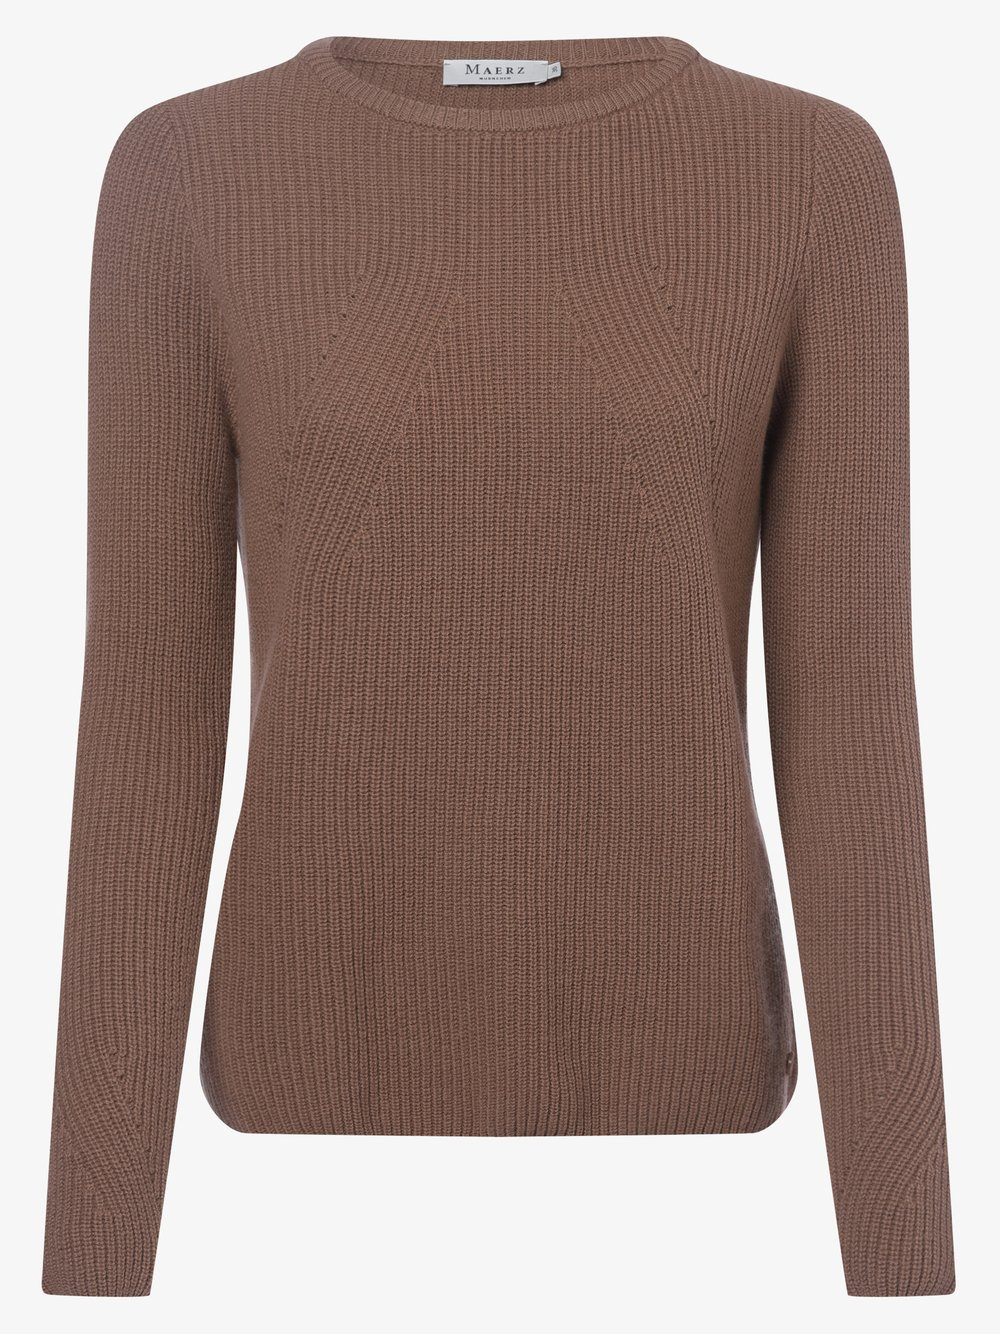 März – Sweter damski, beżowy Van Graaf 375482-0006-00420